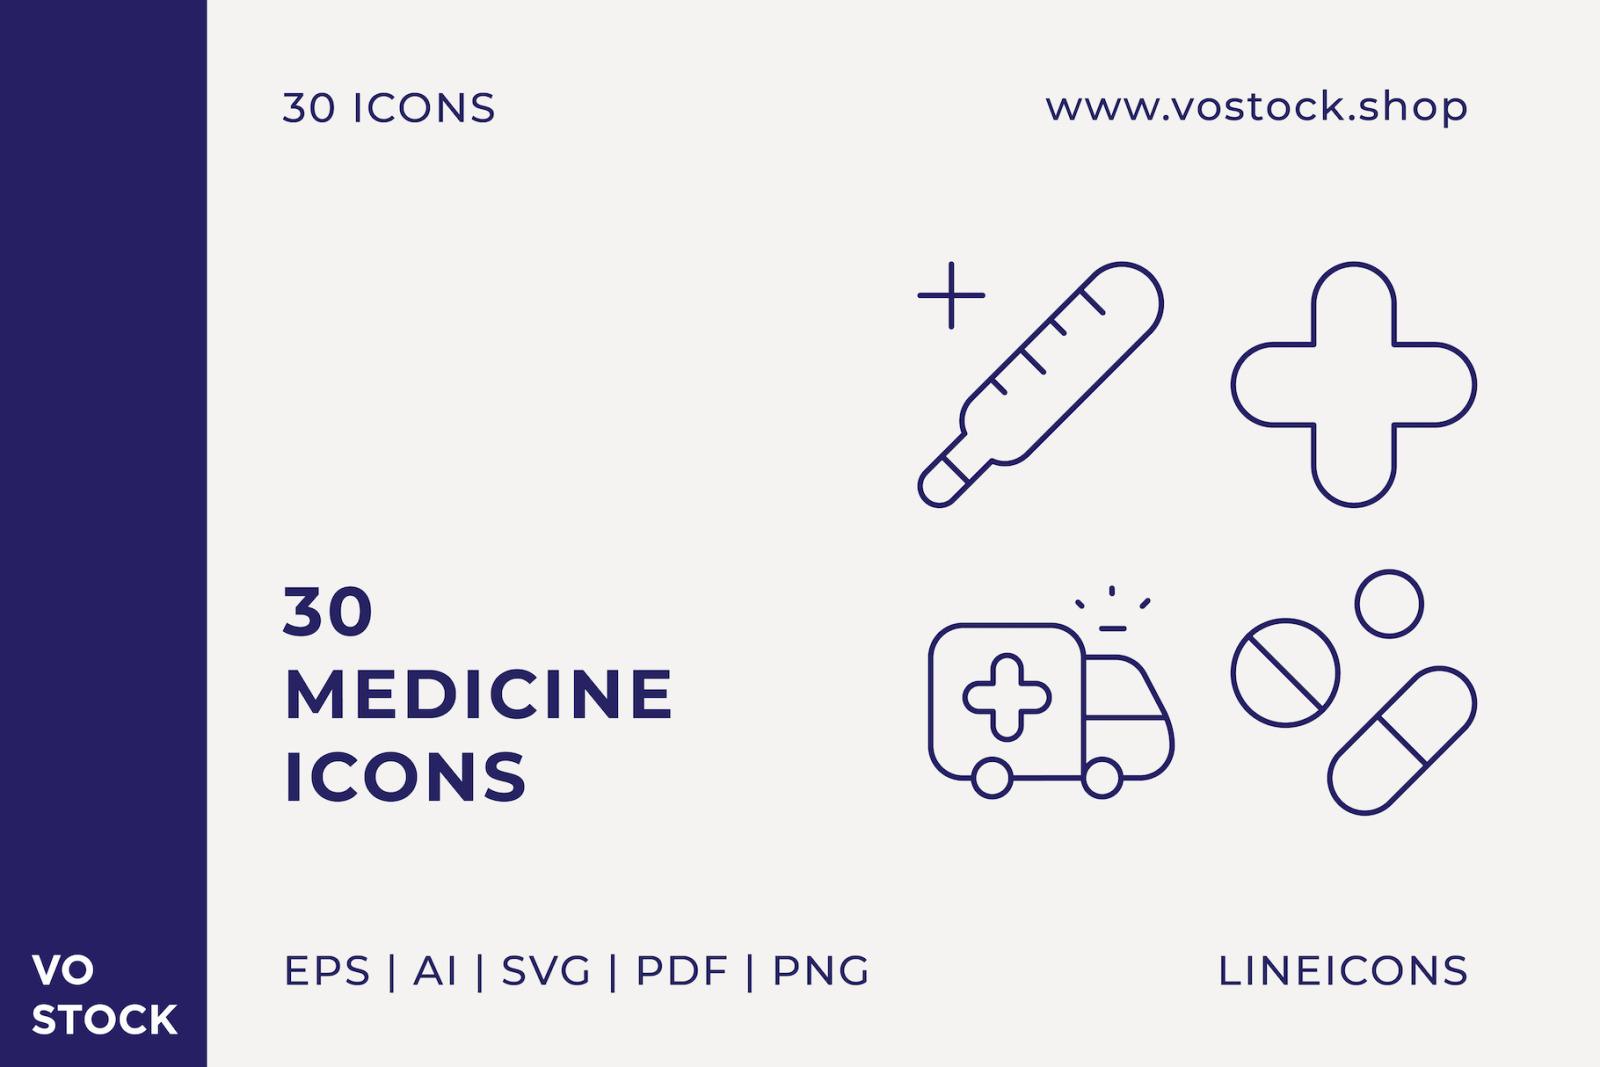 30 Medicine Icons